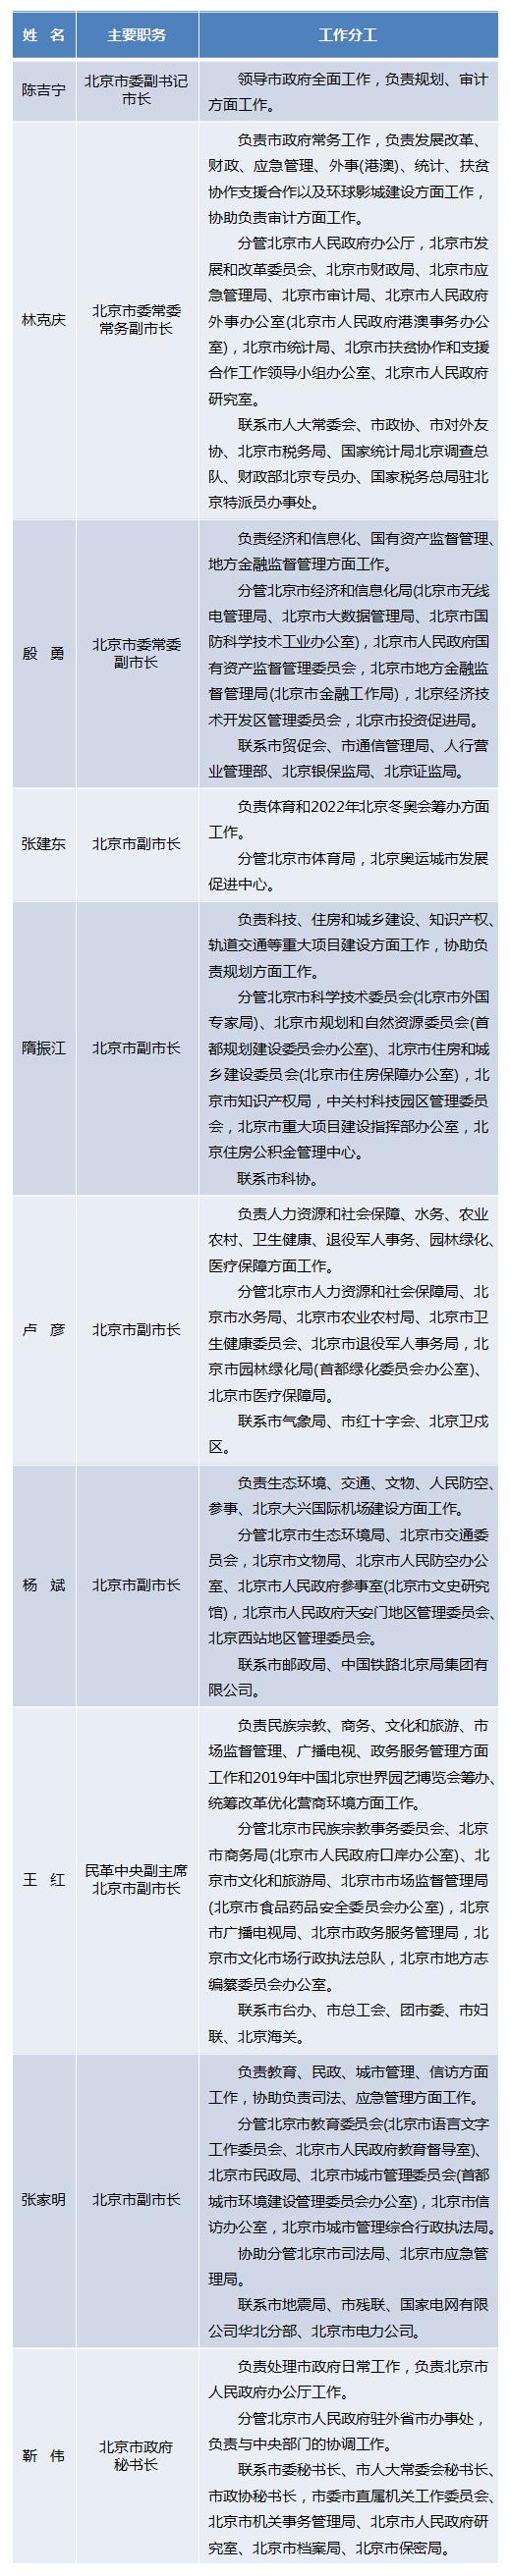 北京市政府�F任�I�О嘧臃止ご_定重大�目由副市�L��